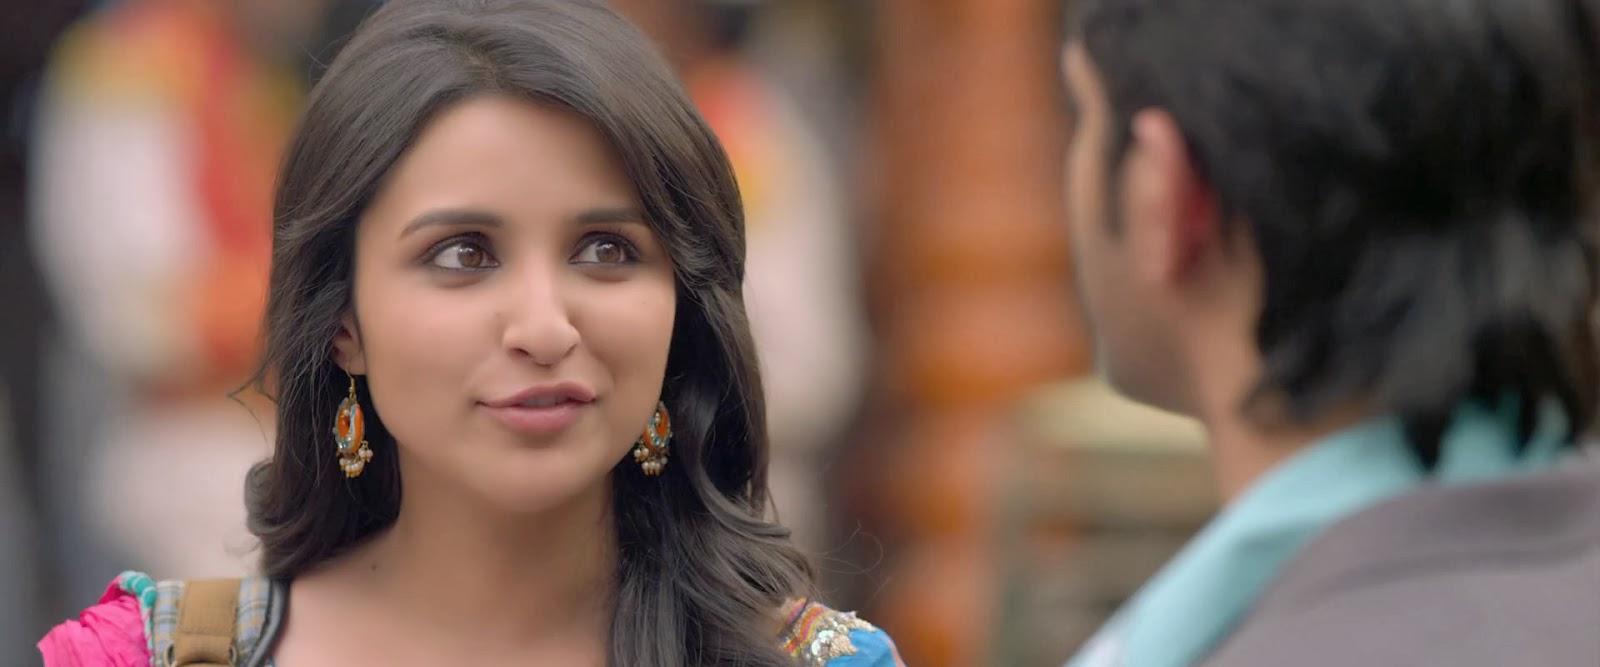 Shuddh Desi Romance (2013) S6 s Shuddh Desi Romance (2013)